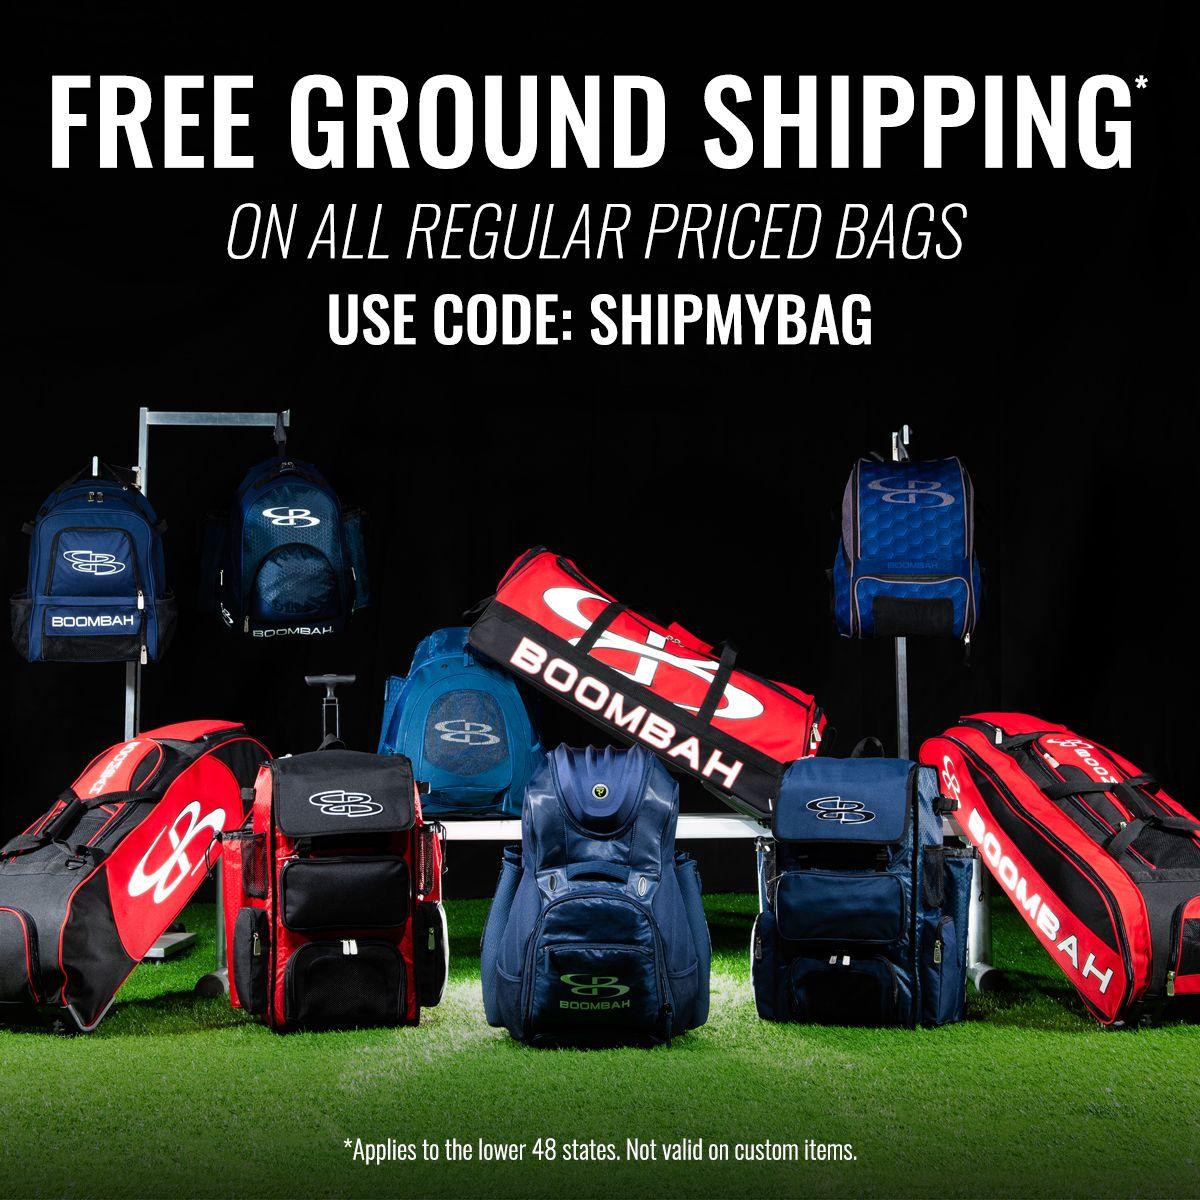 Get Free Ground Shipping Free Returns And Free Exchanges On All Regular Priced Bags Use Code Shipmybag At Che Asa Softball Slow Pitch Softball Usa Baseball